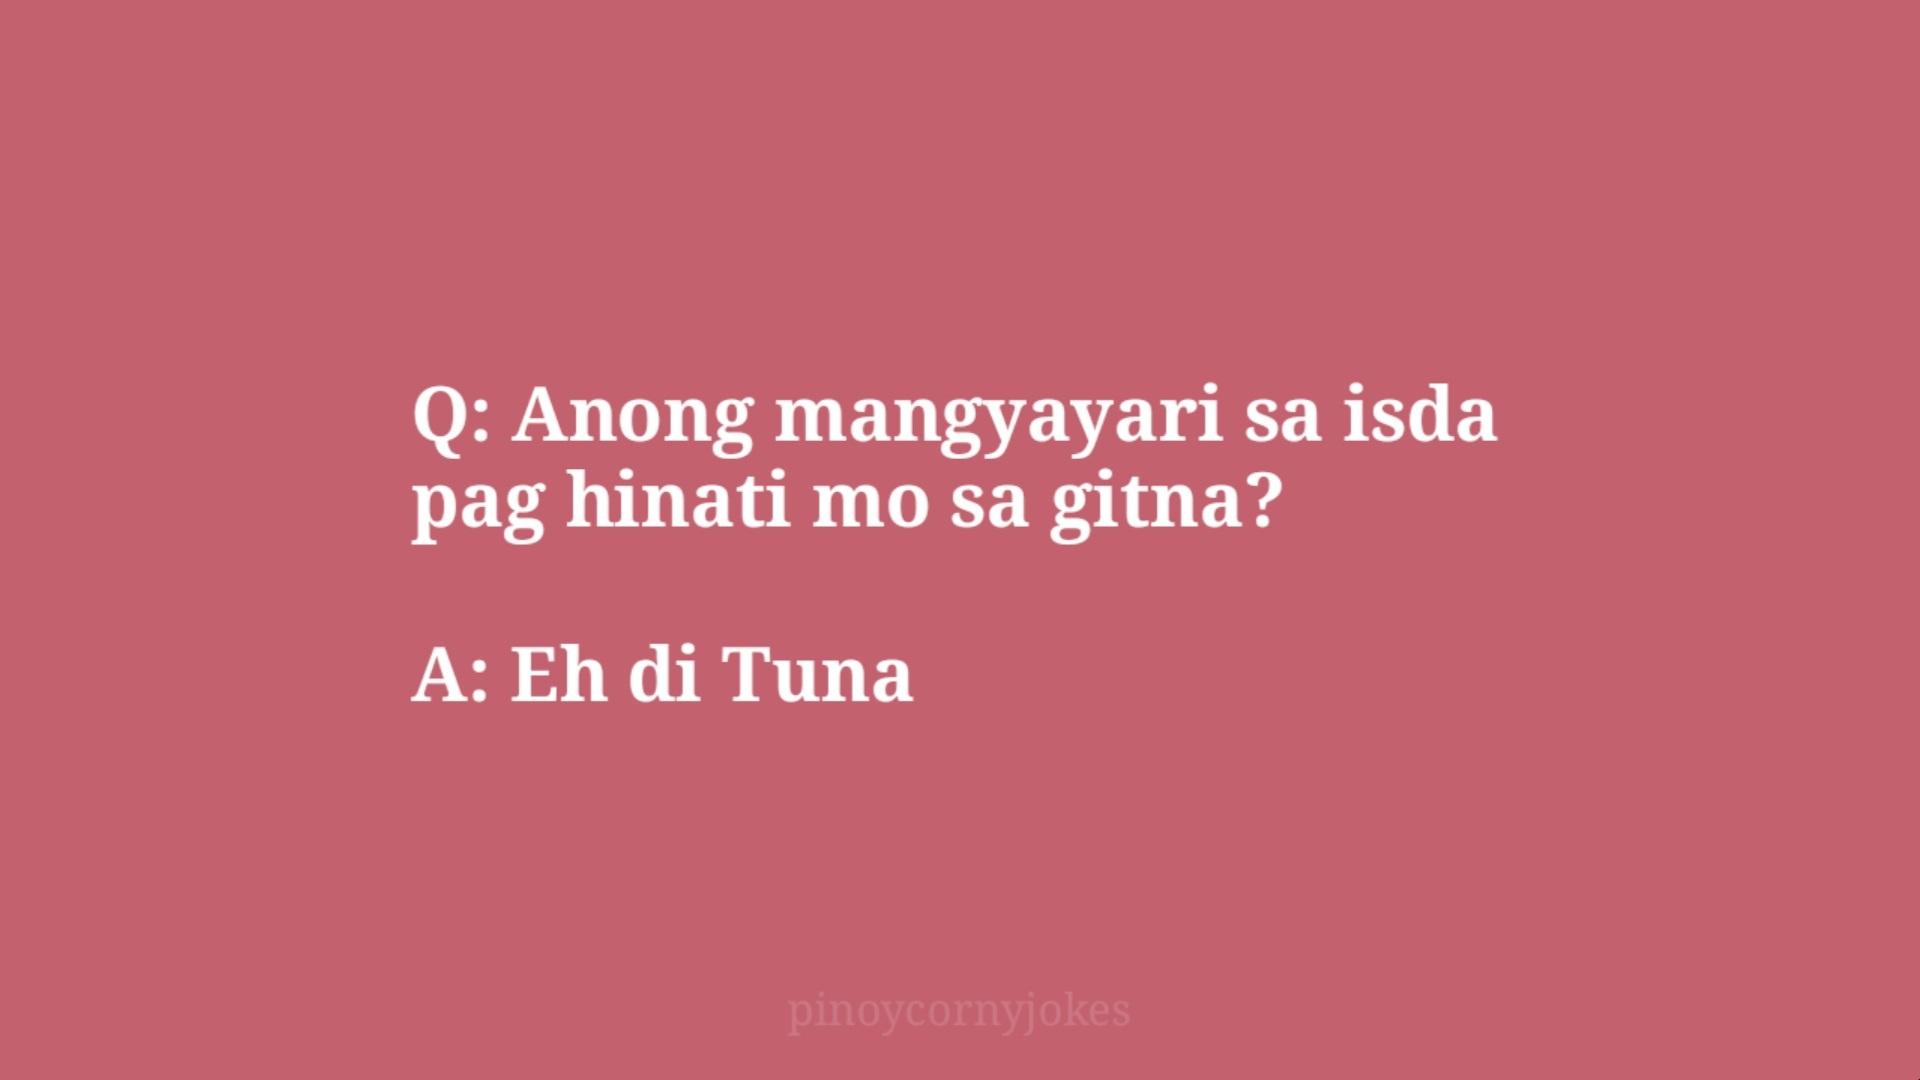 tuna best q and a tagalog jokes 2021